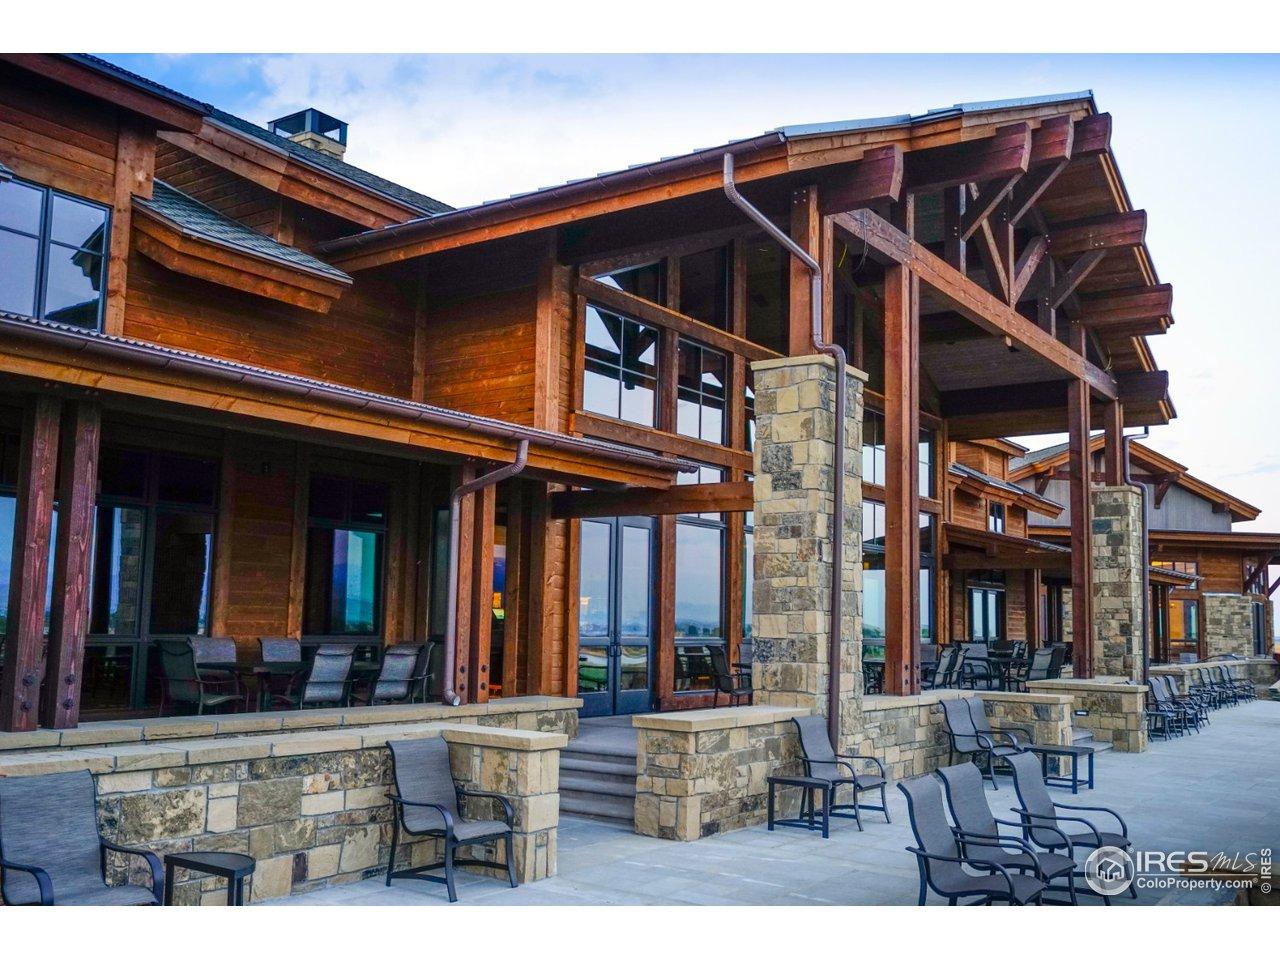 TPC Colorado Clubhouse